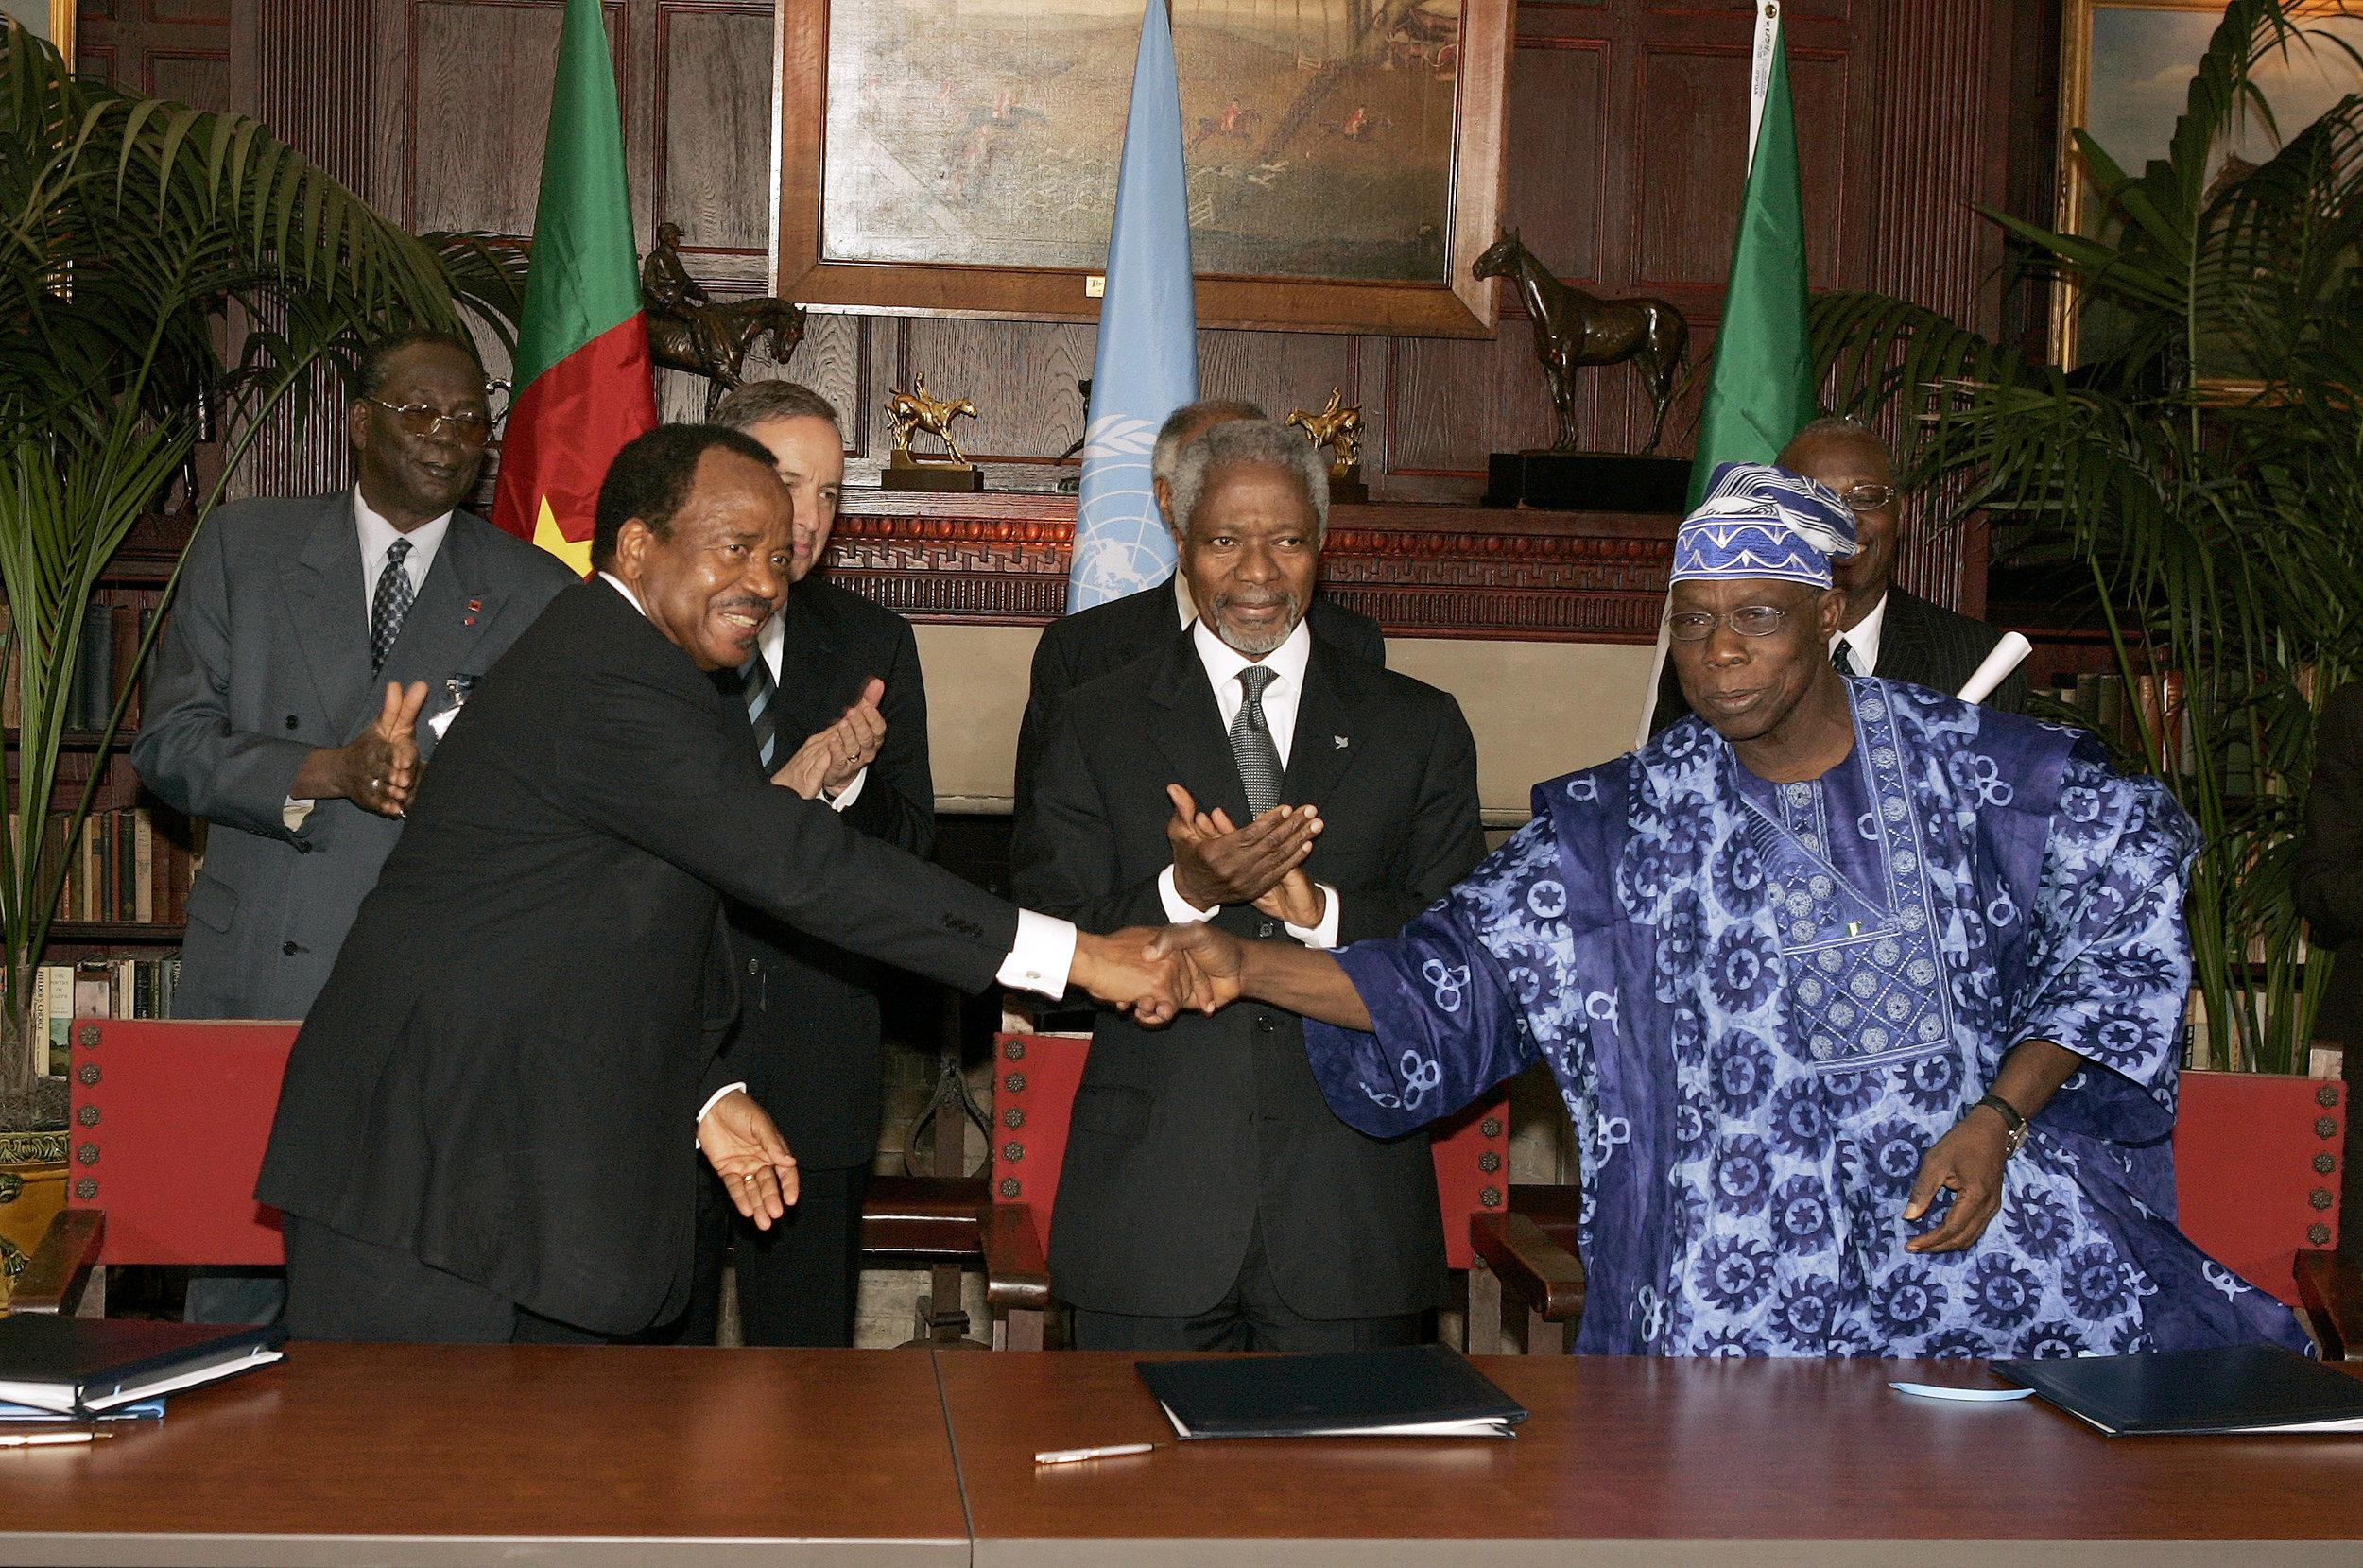 Paul Biya (Cameroon),Kofi Annan (UN) and Olusegun Obasanjo (Nigeria).  Image:  Presidency of The Republic of Cameroon .